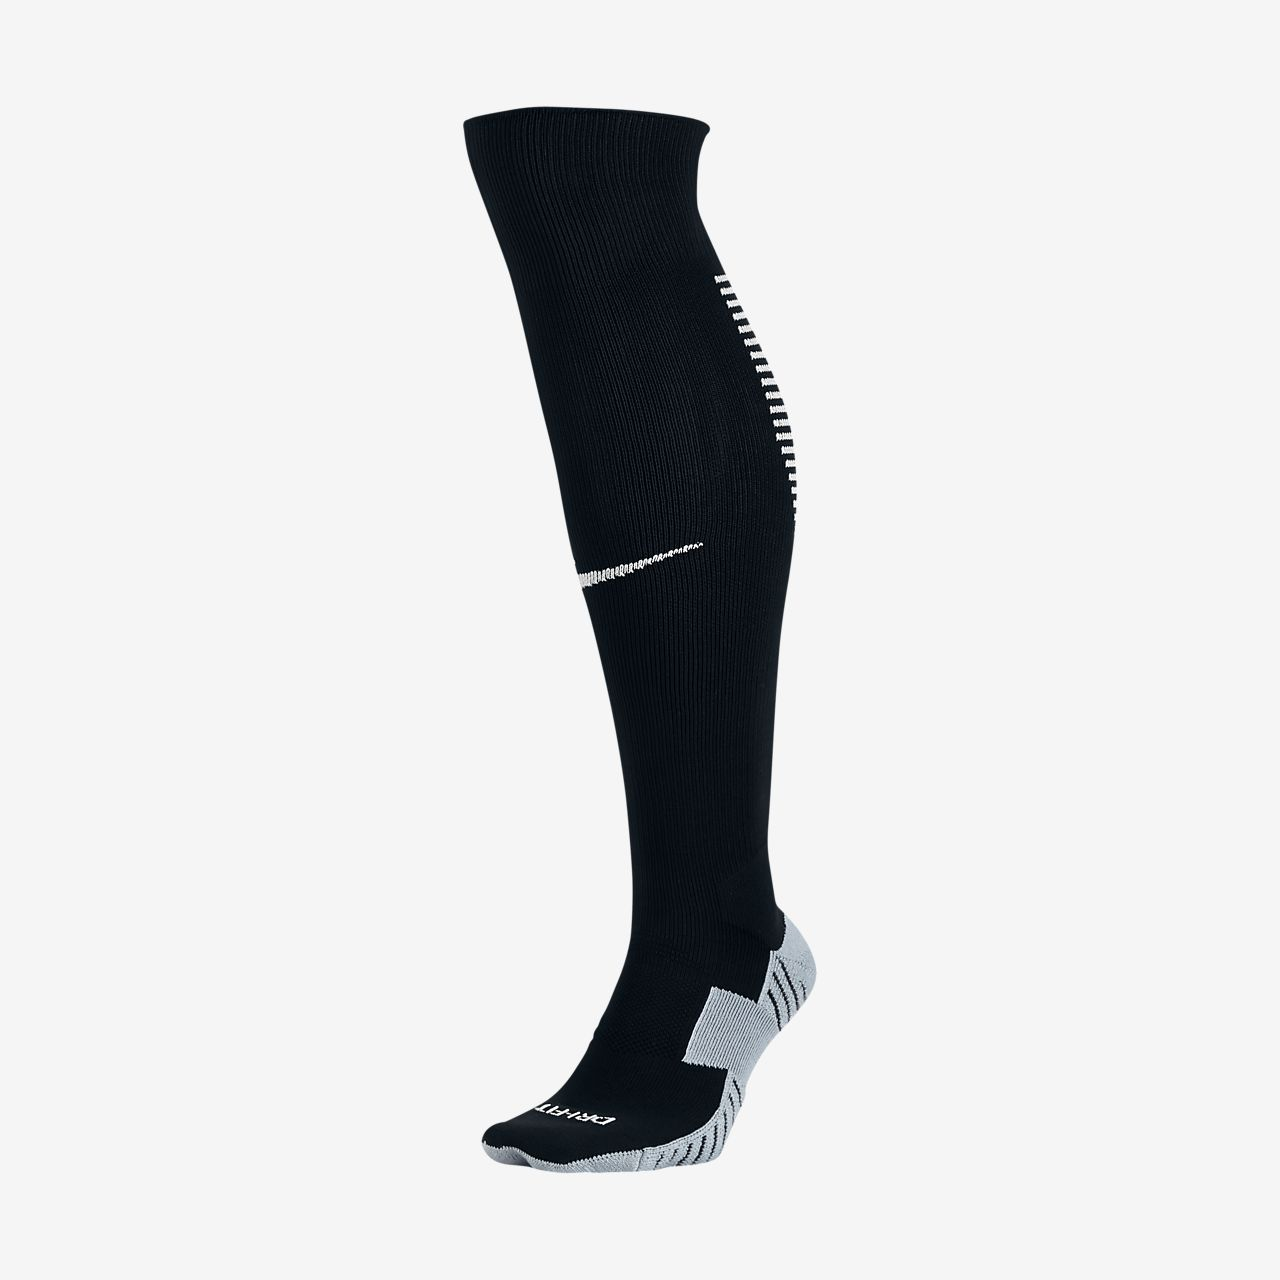 nike stadium overthecalf soccer socks nikecom